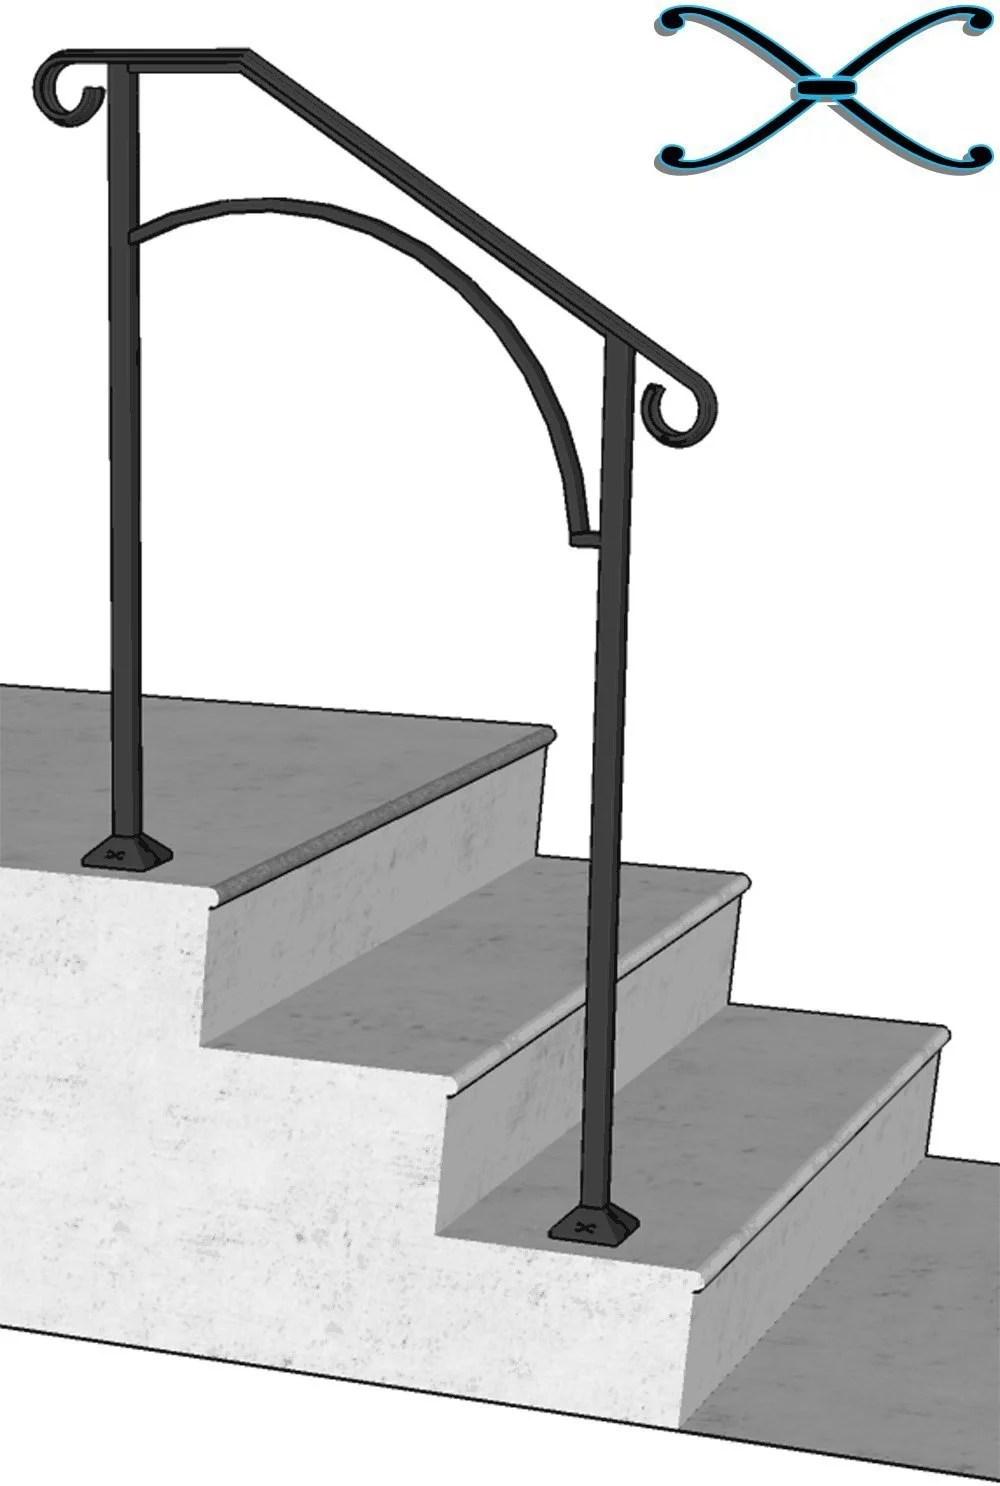 Iron X Handrail Arch 2 Concrete Steps Walmart Com Walmart Com   Handrails For Concrete Steps   Concrete Surface Mount Stair Railing   Back Patio   Premade   Landing   Deck Stair